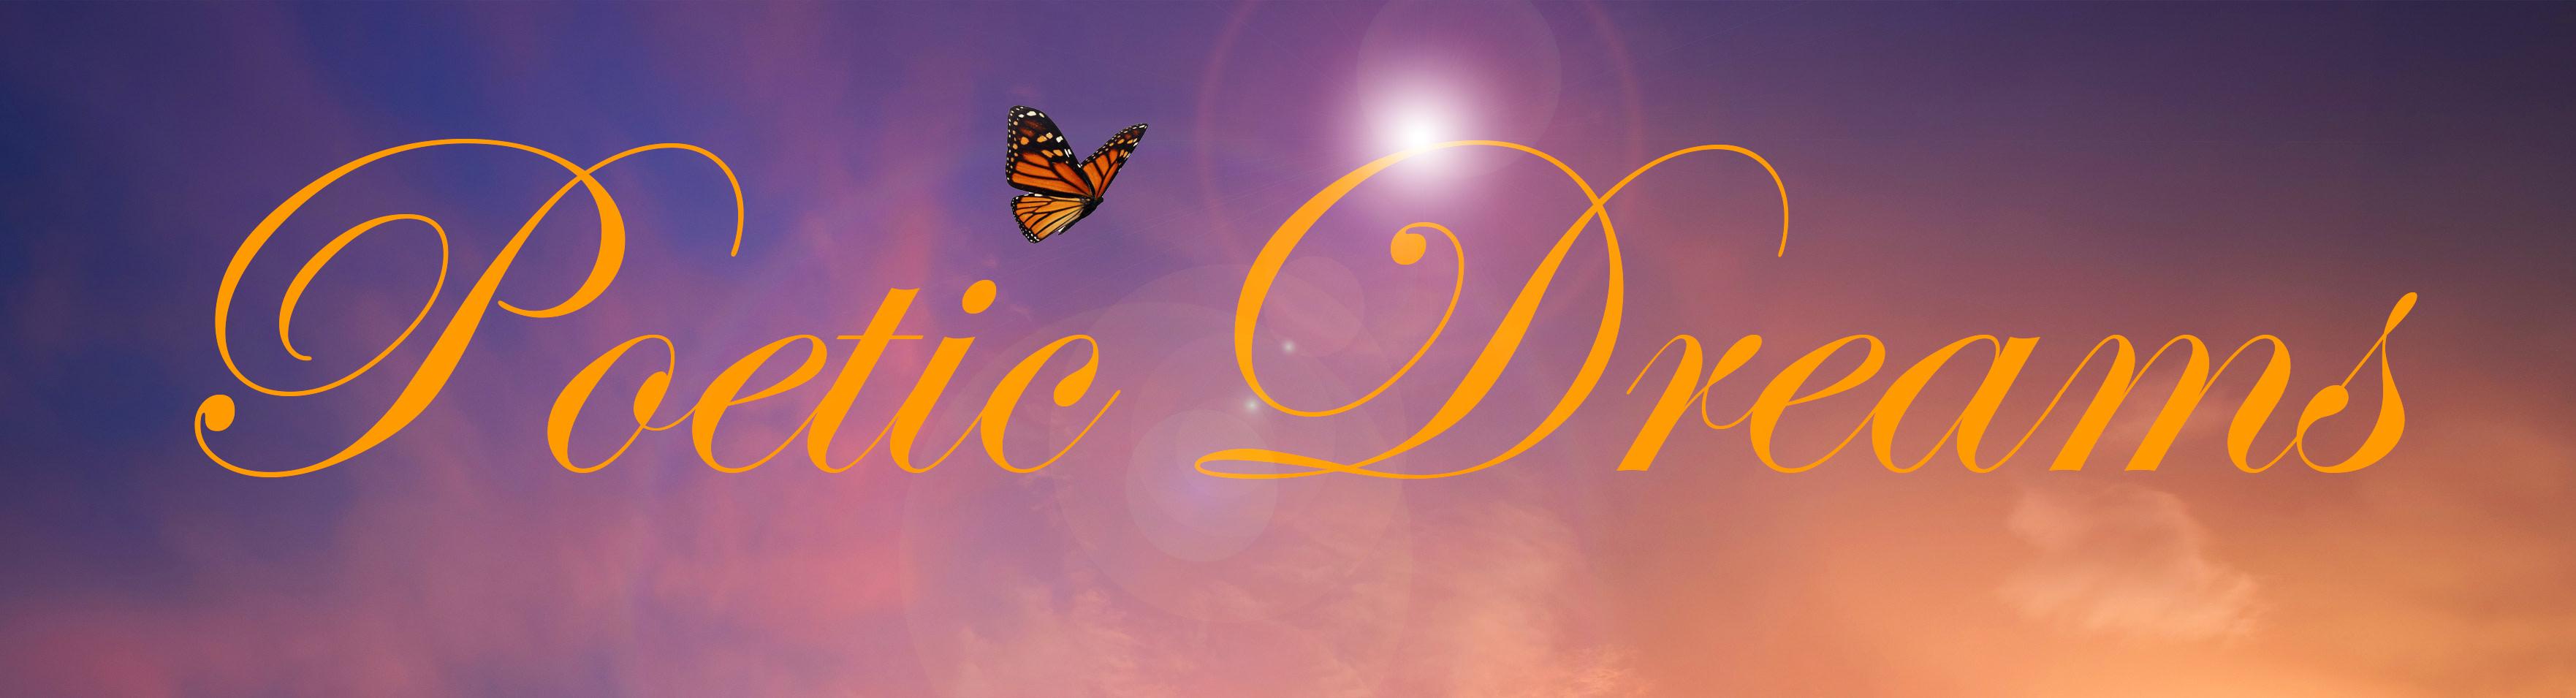 Navigate to the Poetic Dreams homepage